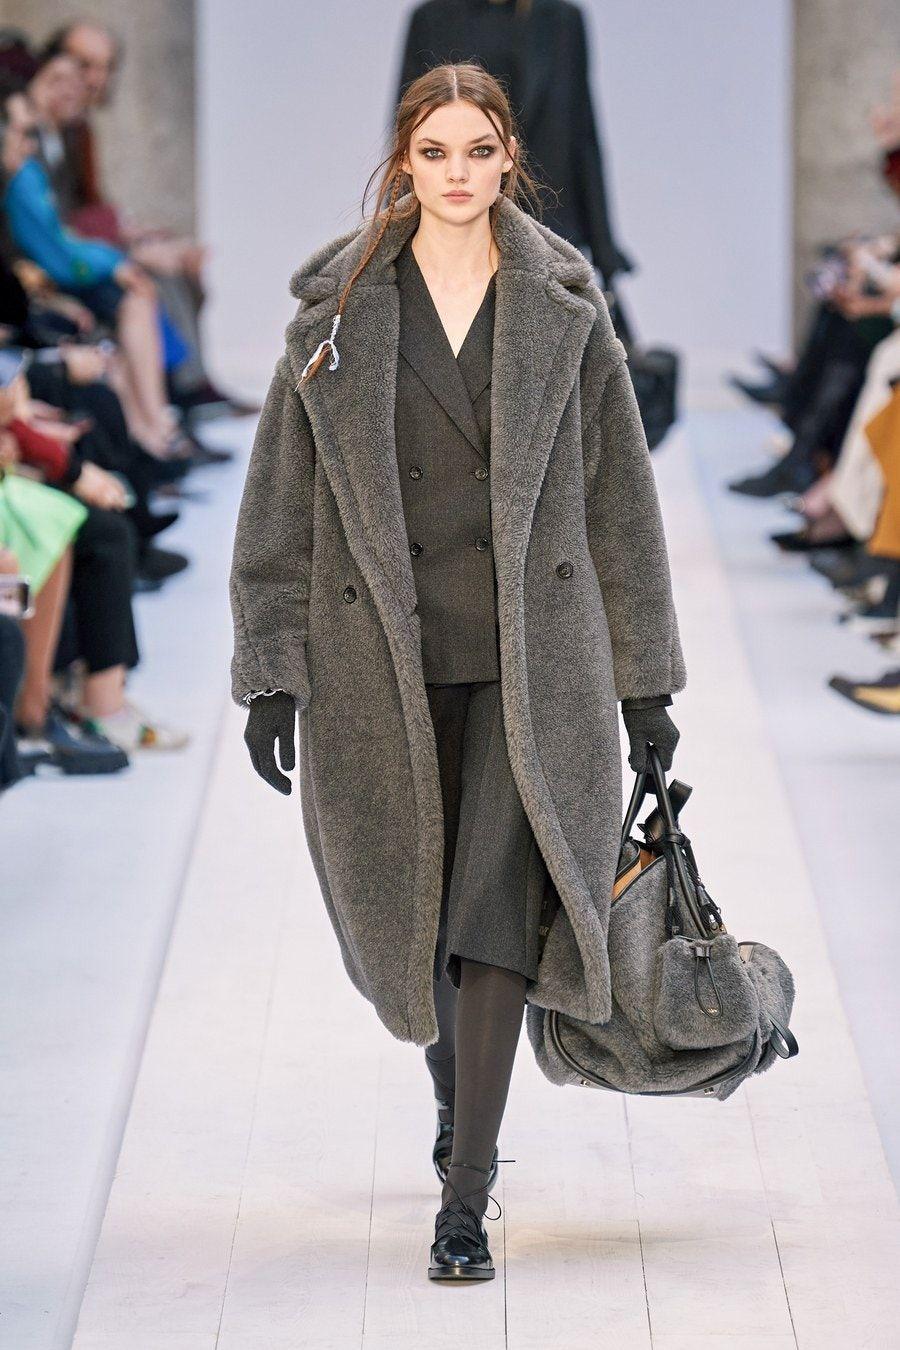 Max Mara Fall 2020 Ready-to-Wear Fashion Show